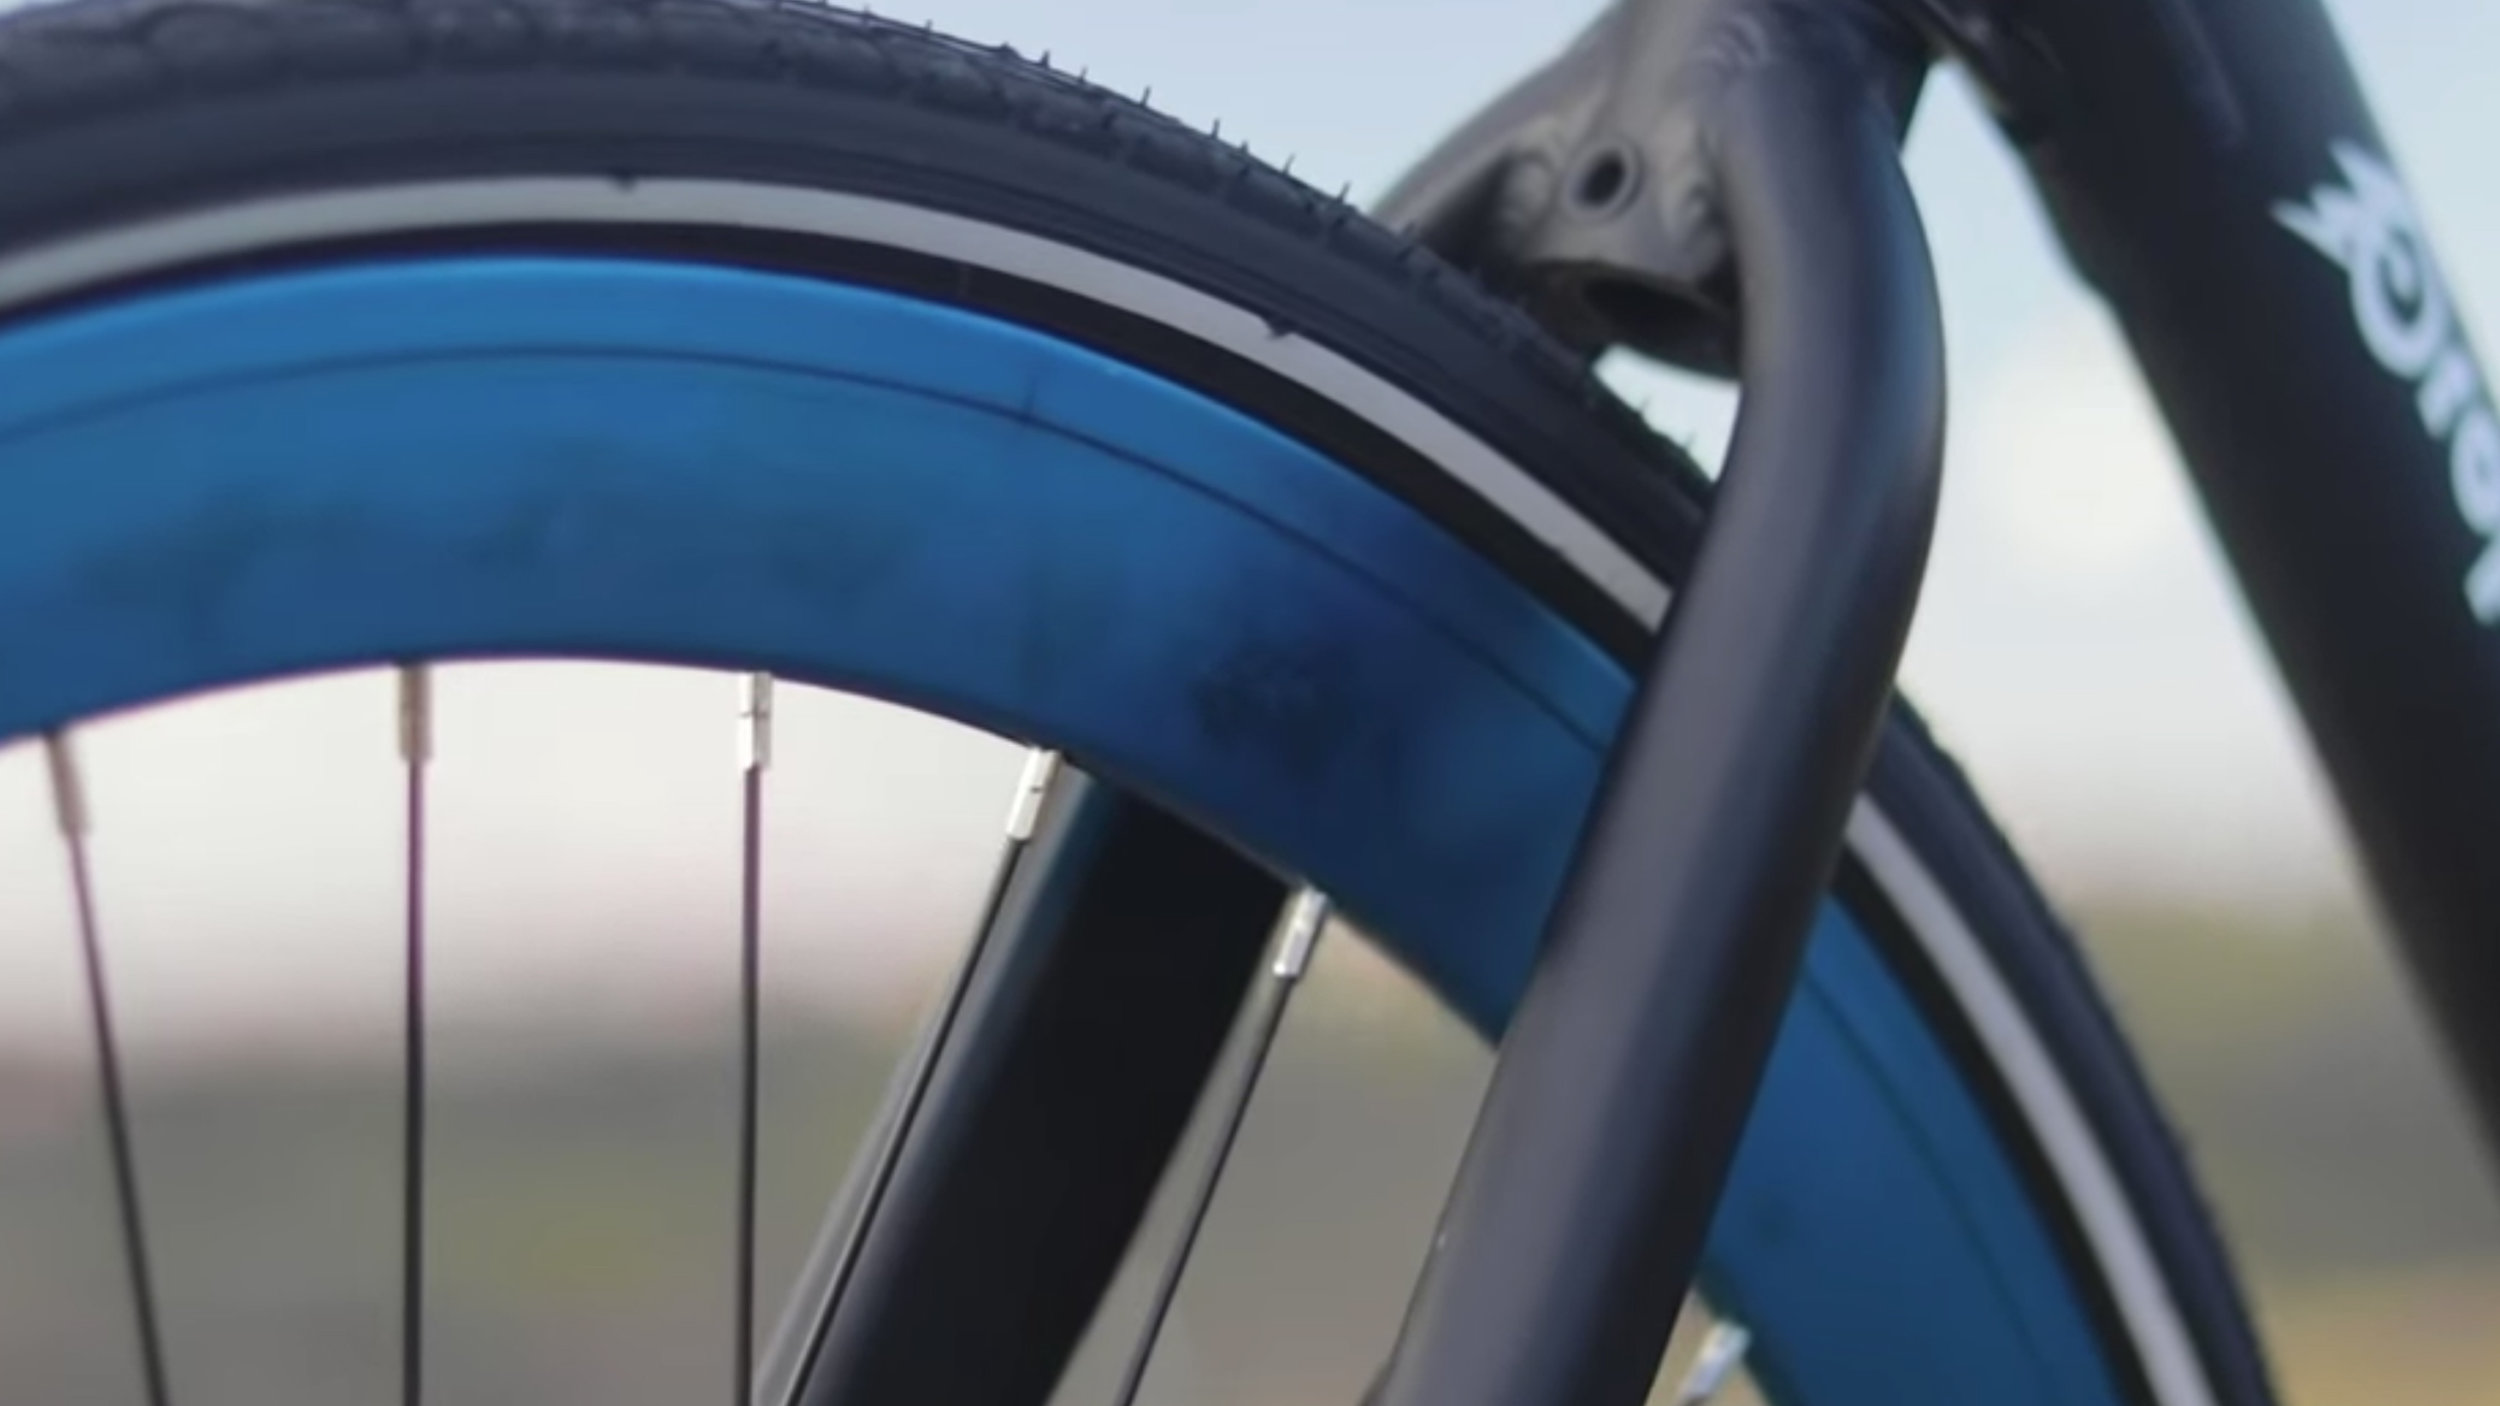 electrified-reviews-propella-2-single-speed-electric-bike-review-rim.jpg